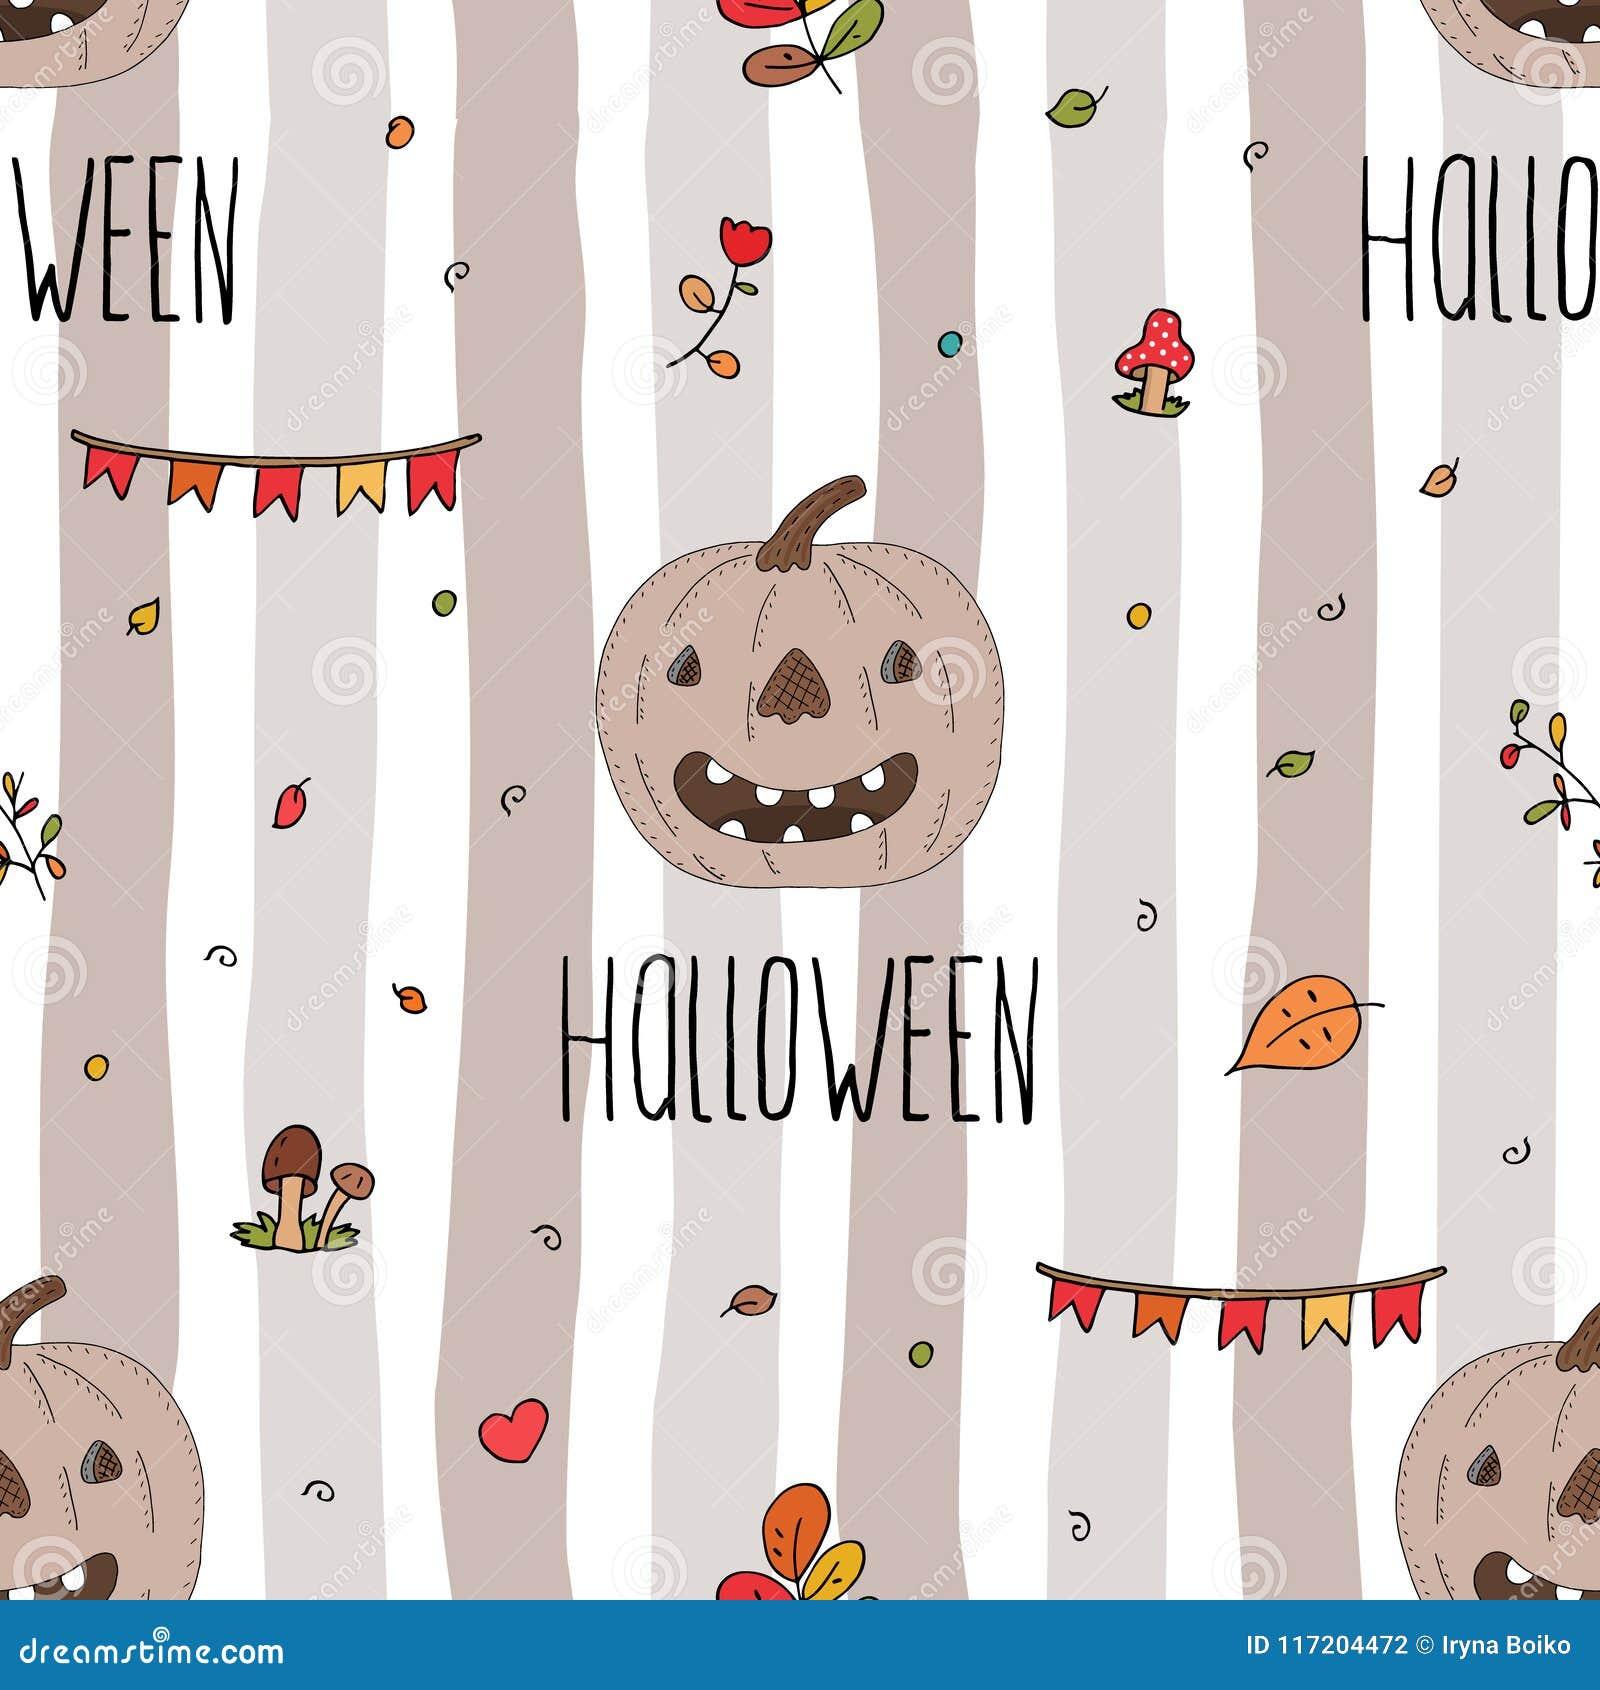 Happy halloween print with pumpkin printable templates stock vector download happy halloween print with pumpkin printable templates stock vector illustration of decorative maxwellsz